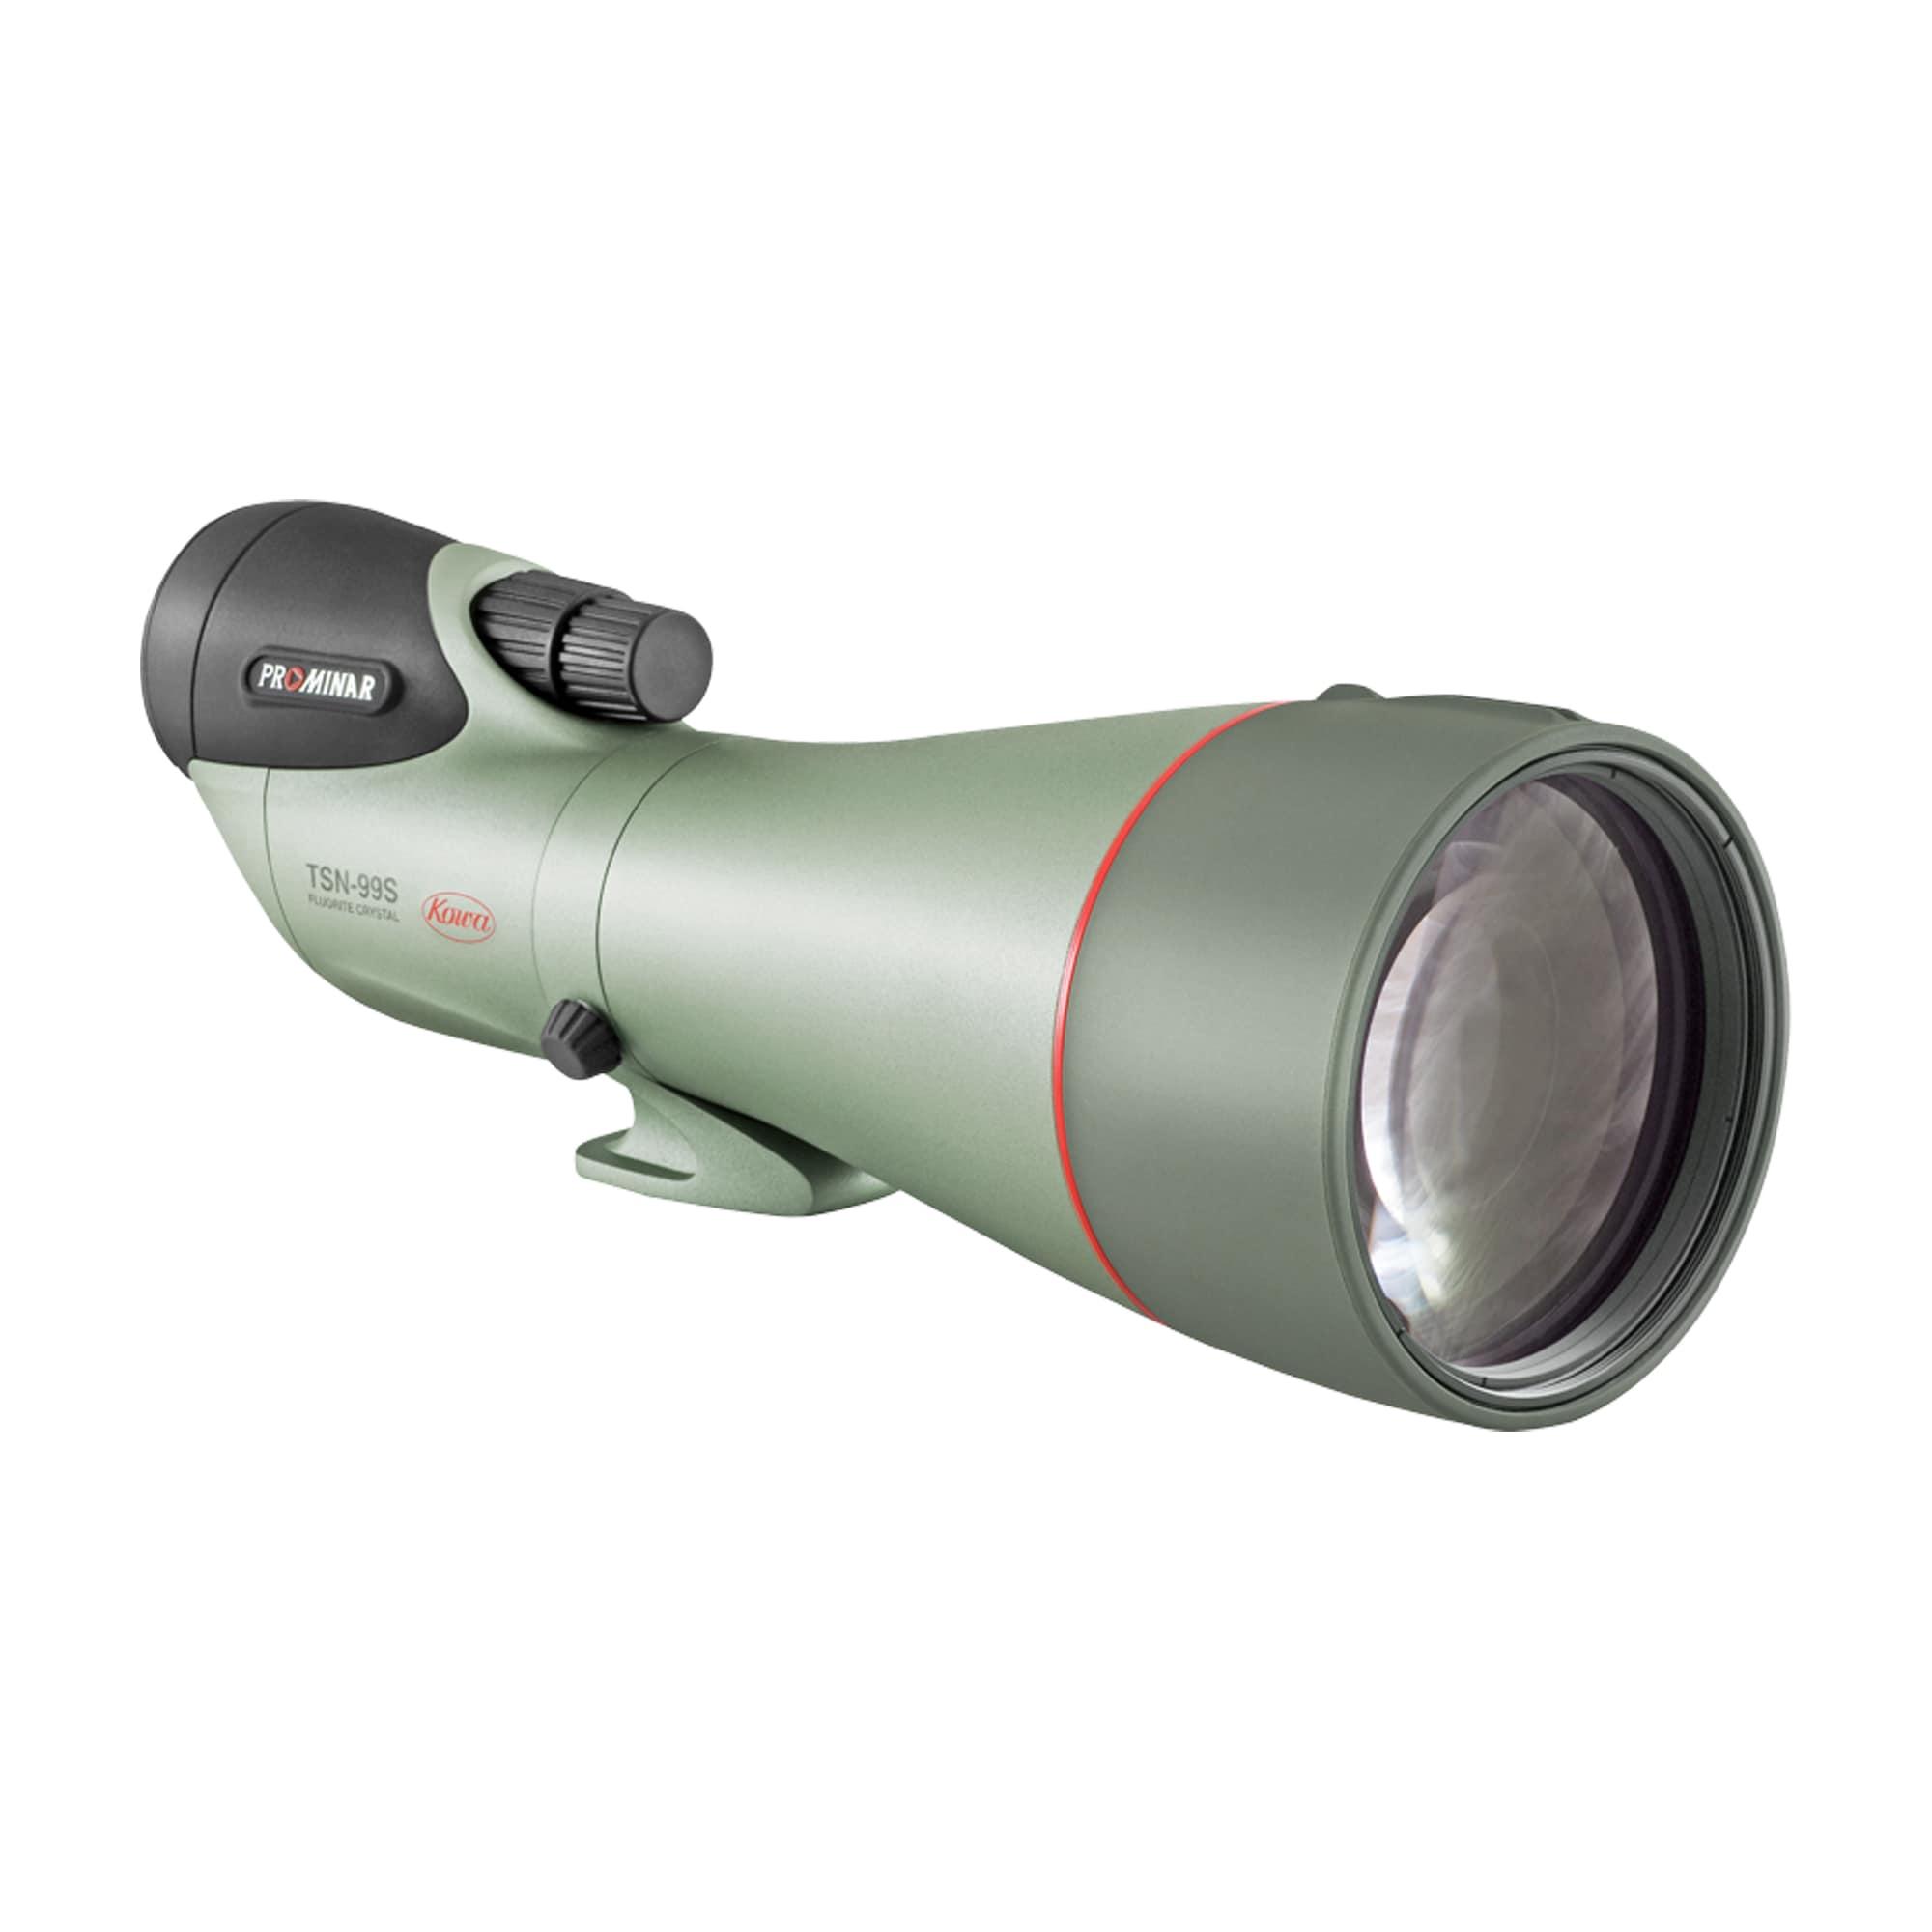 Kowa Spottingscope TSN-99S PROMINAR